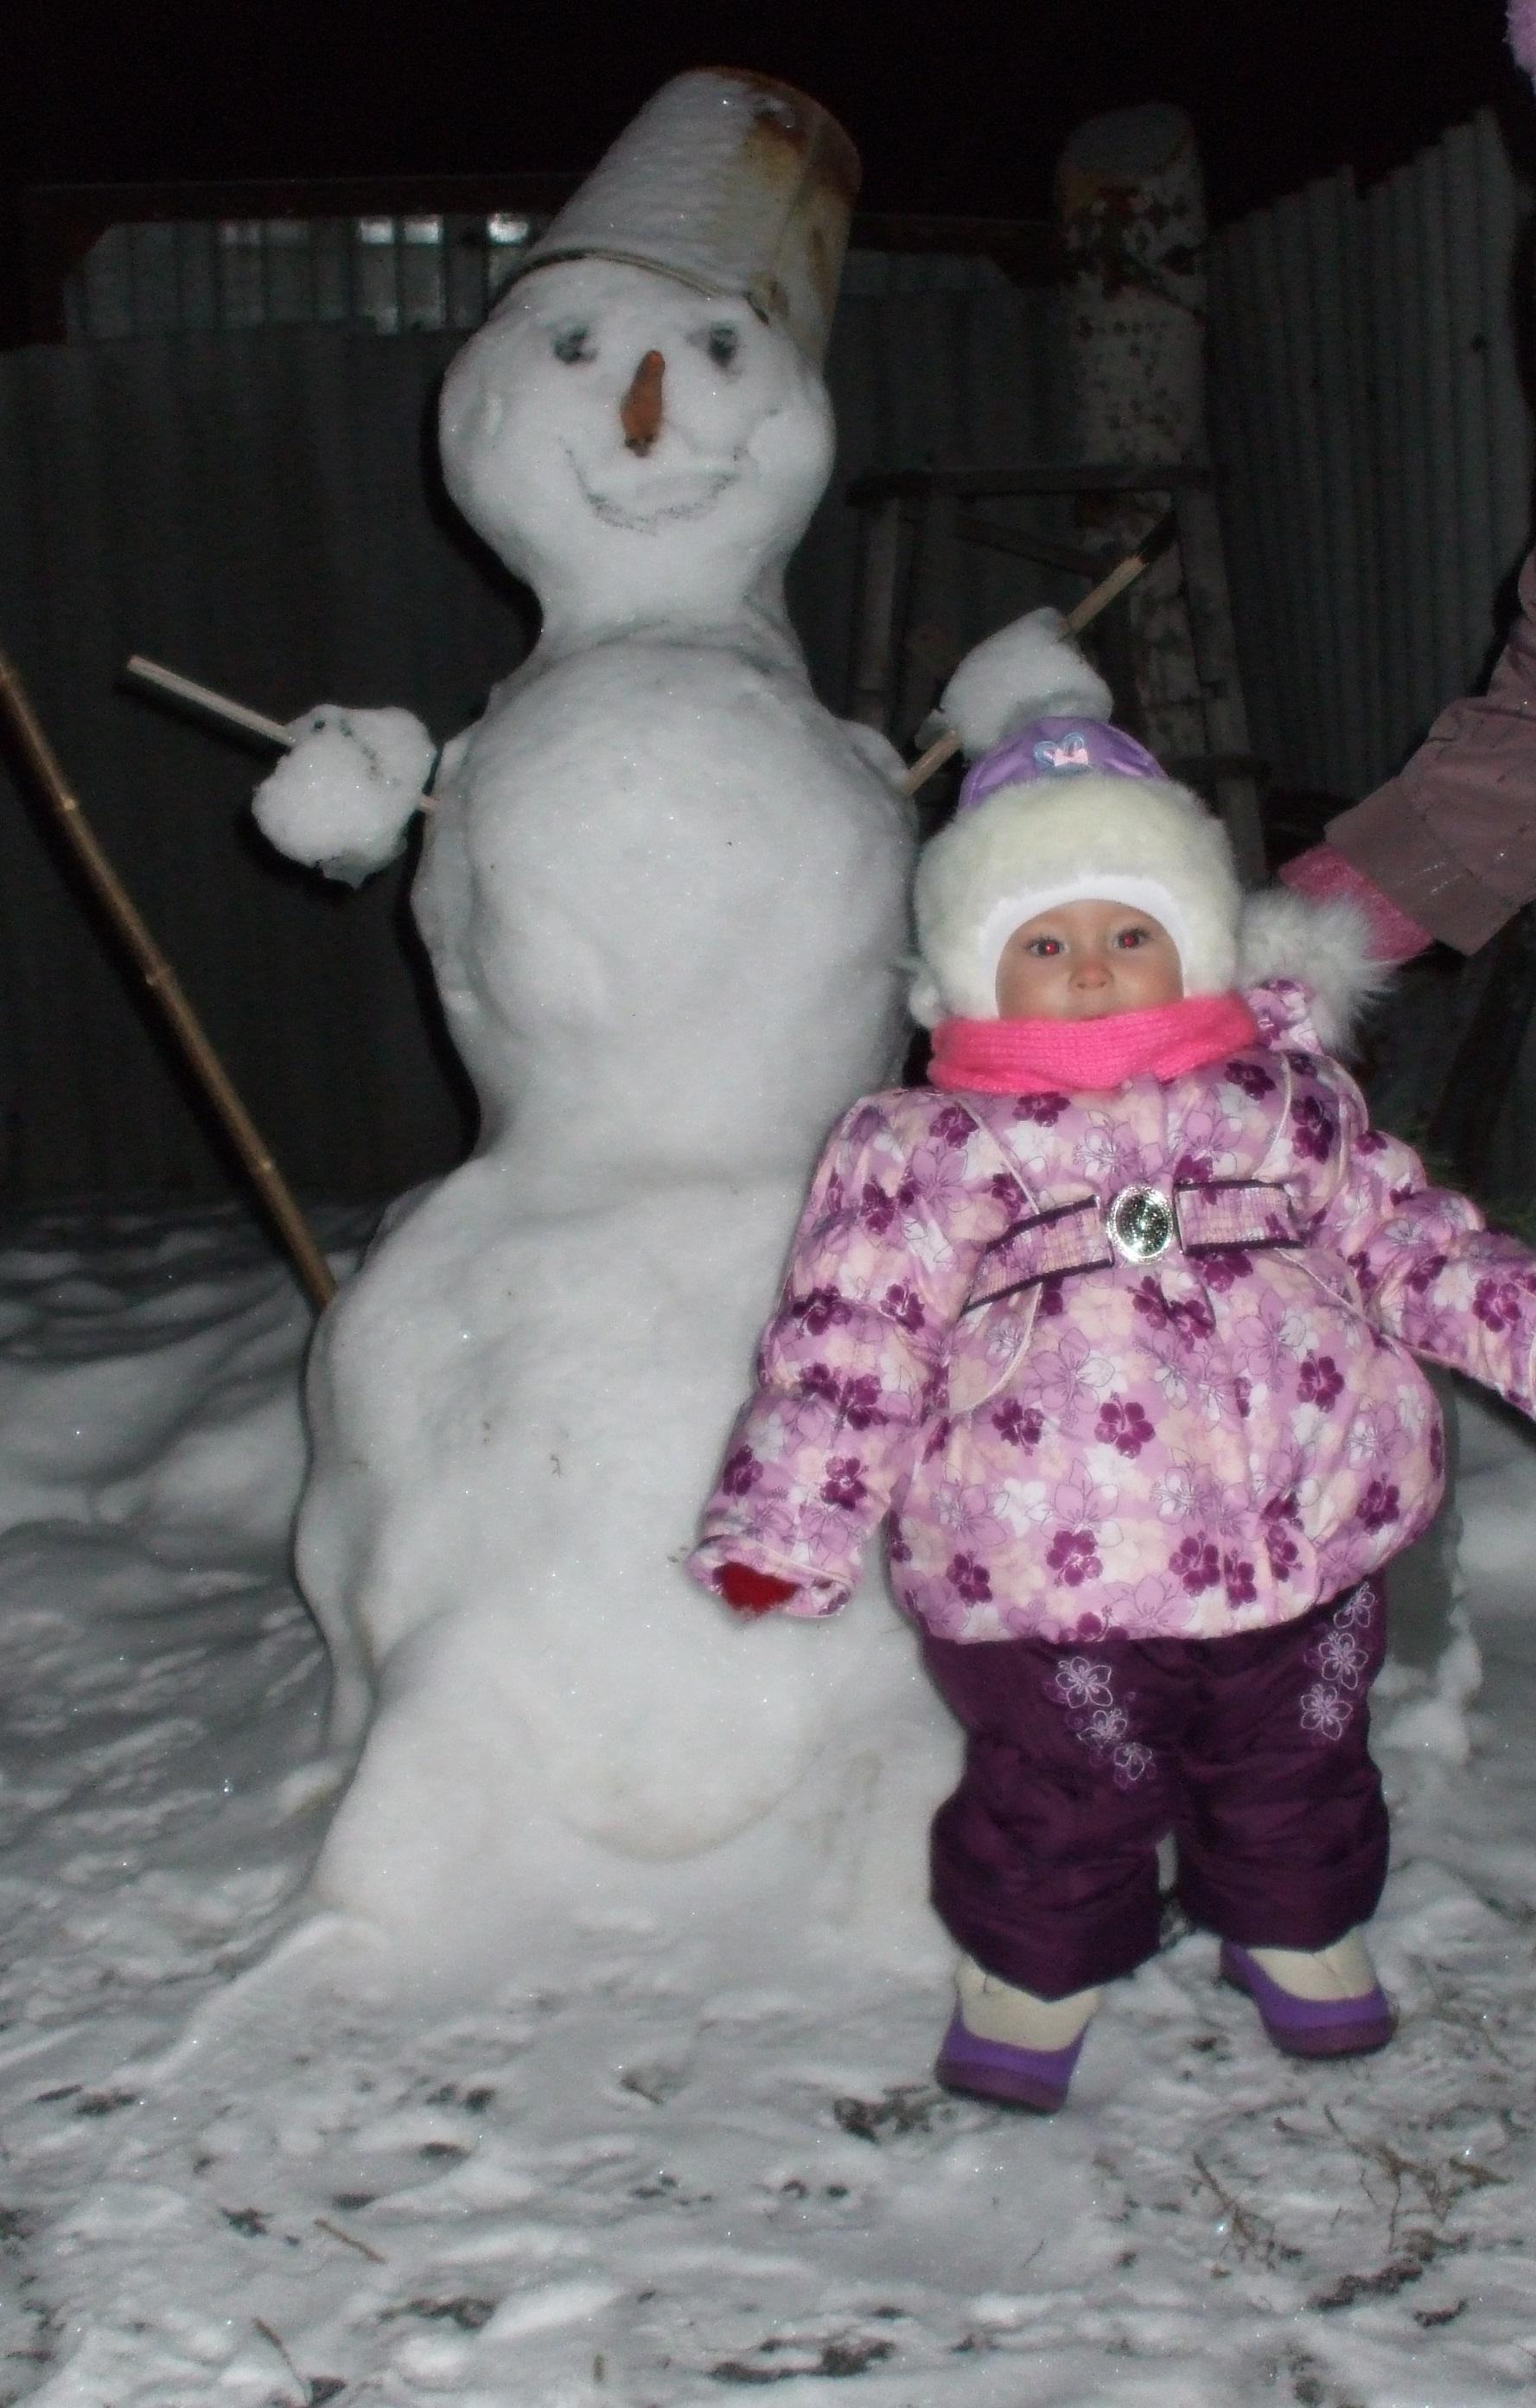 2 снеговика. Блиц: фигуры из снега